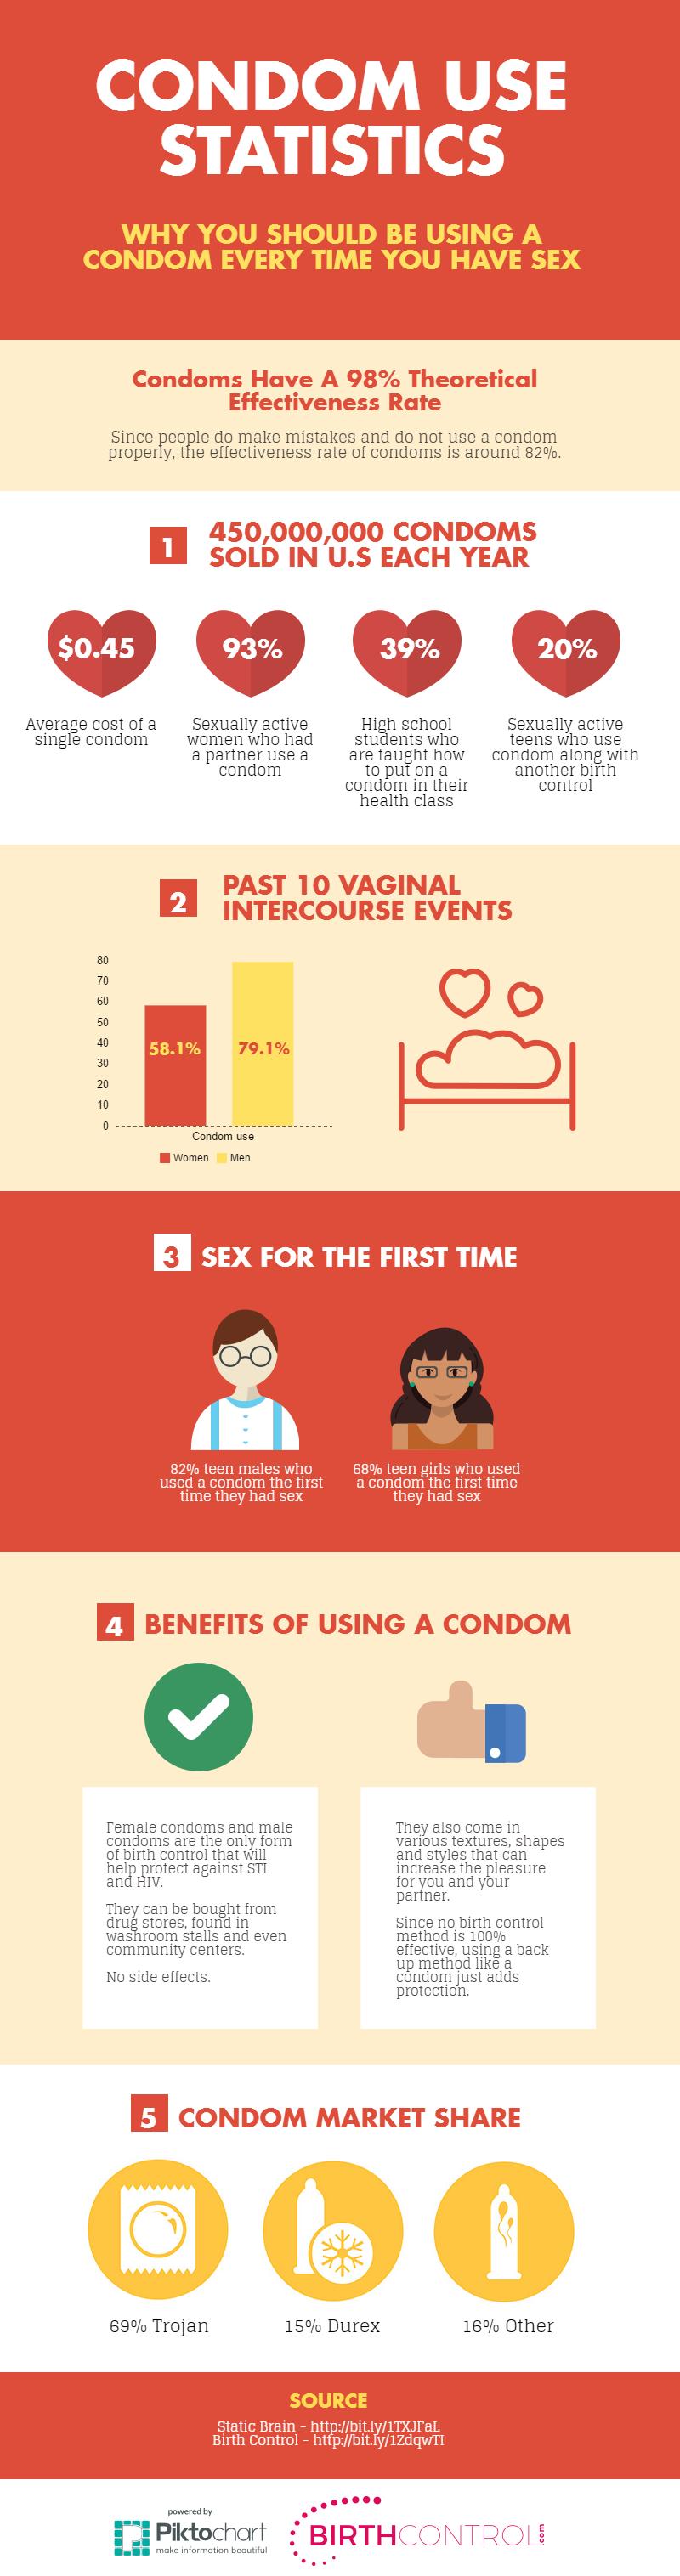 condom use statistics